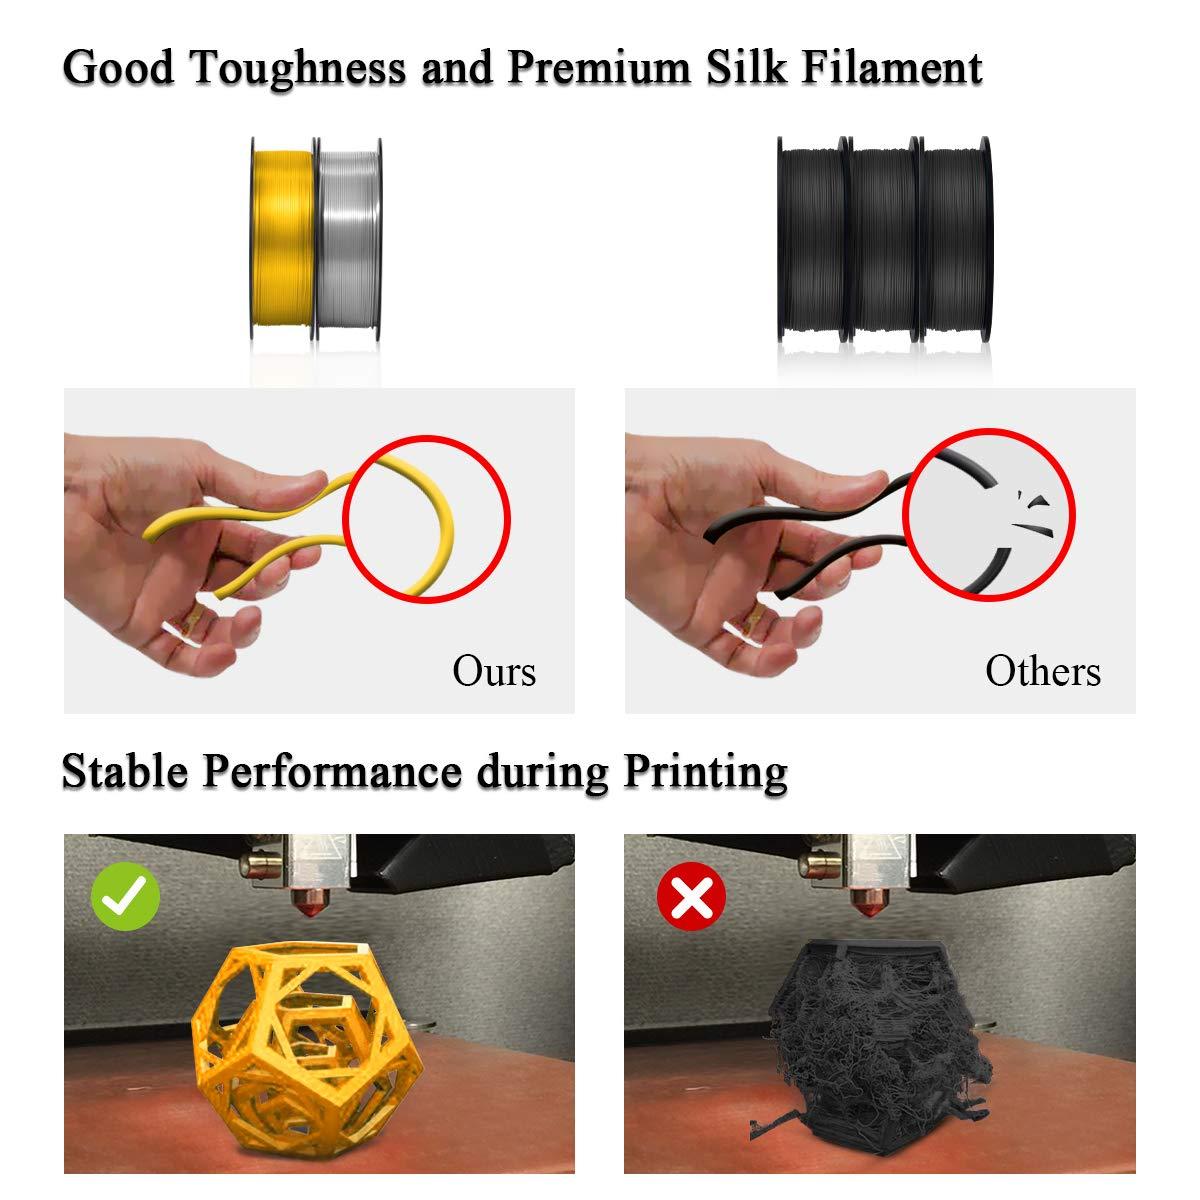 0.02 mm // Shiny Silk White PLA Filament 1.75mm,3D Warhorse PLA 3D Printer Filament,1KG//Spool,Metal Shiny PLA Printing Materials,Dimensional Accuracy